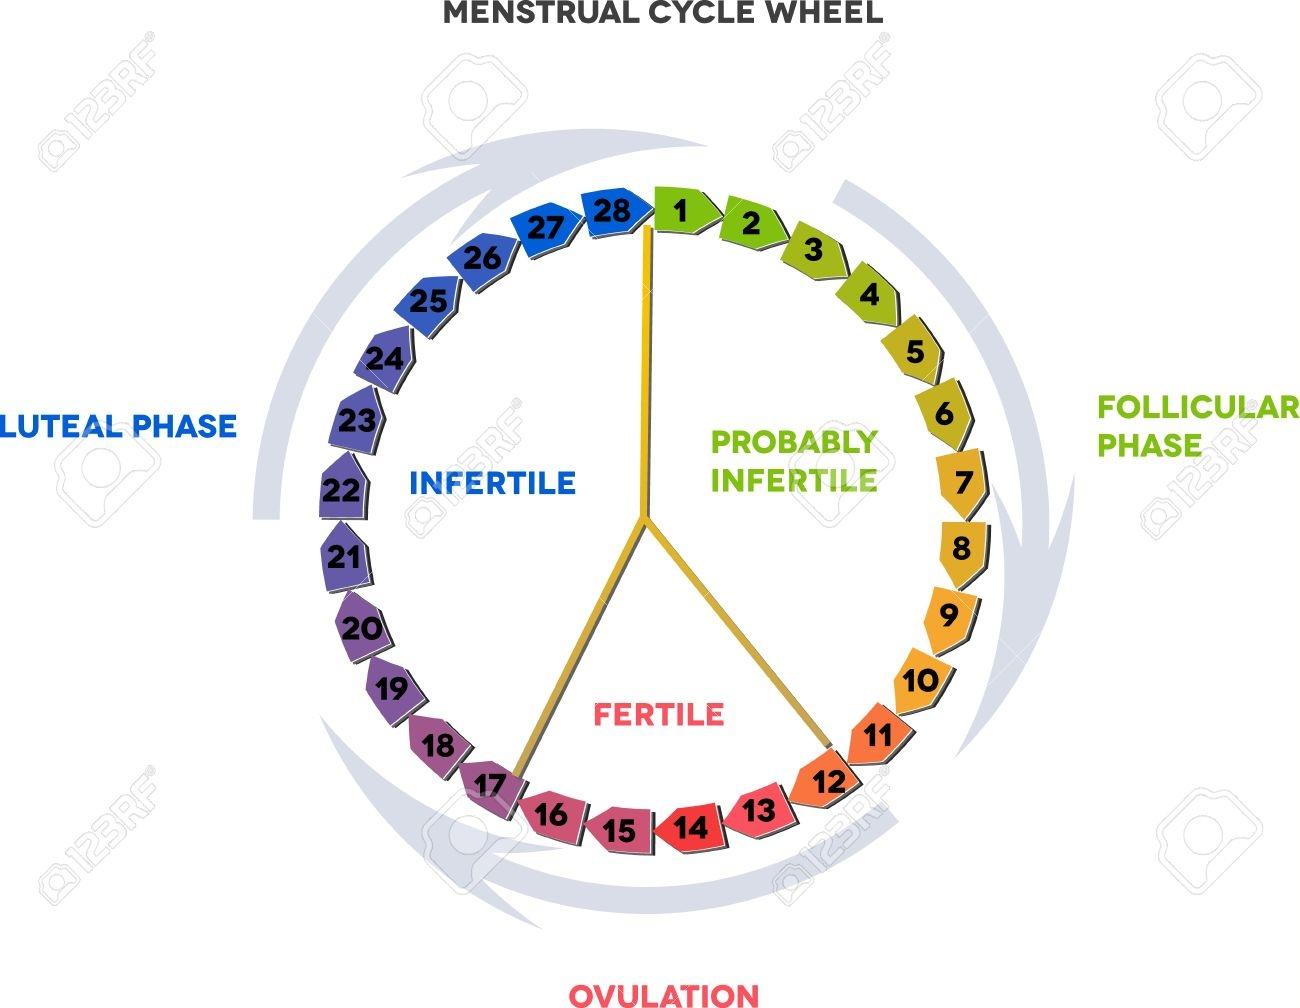 Menstrual Cycle Wheel Avarage Menstrual Cycle Follicular Phase3abry